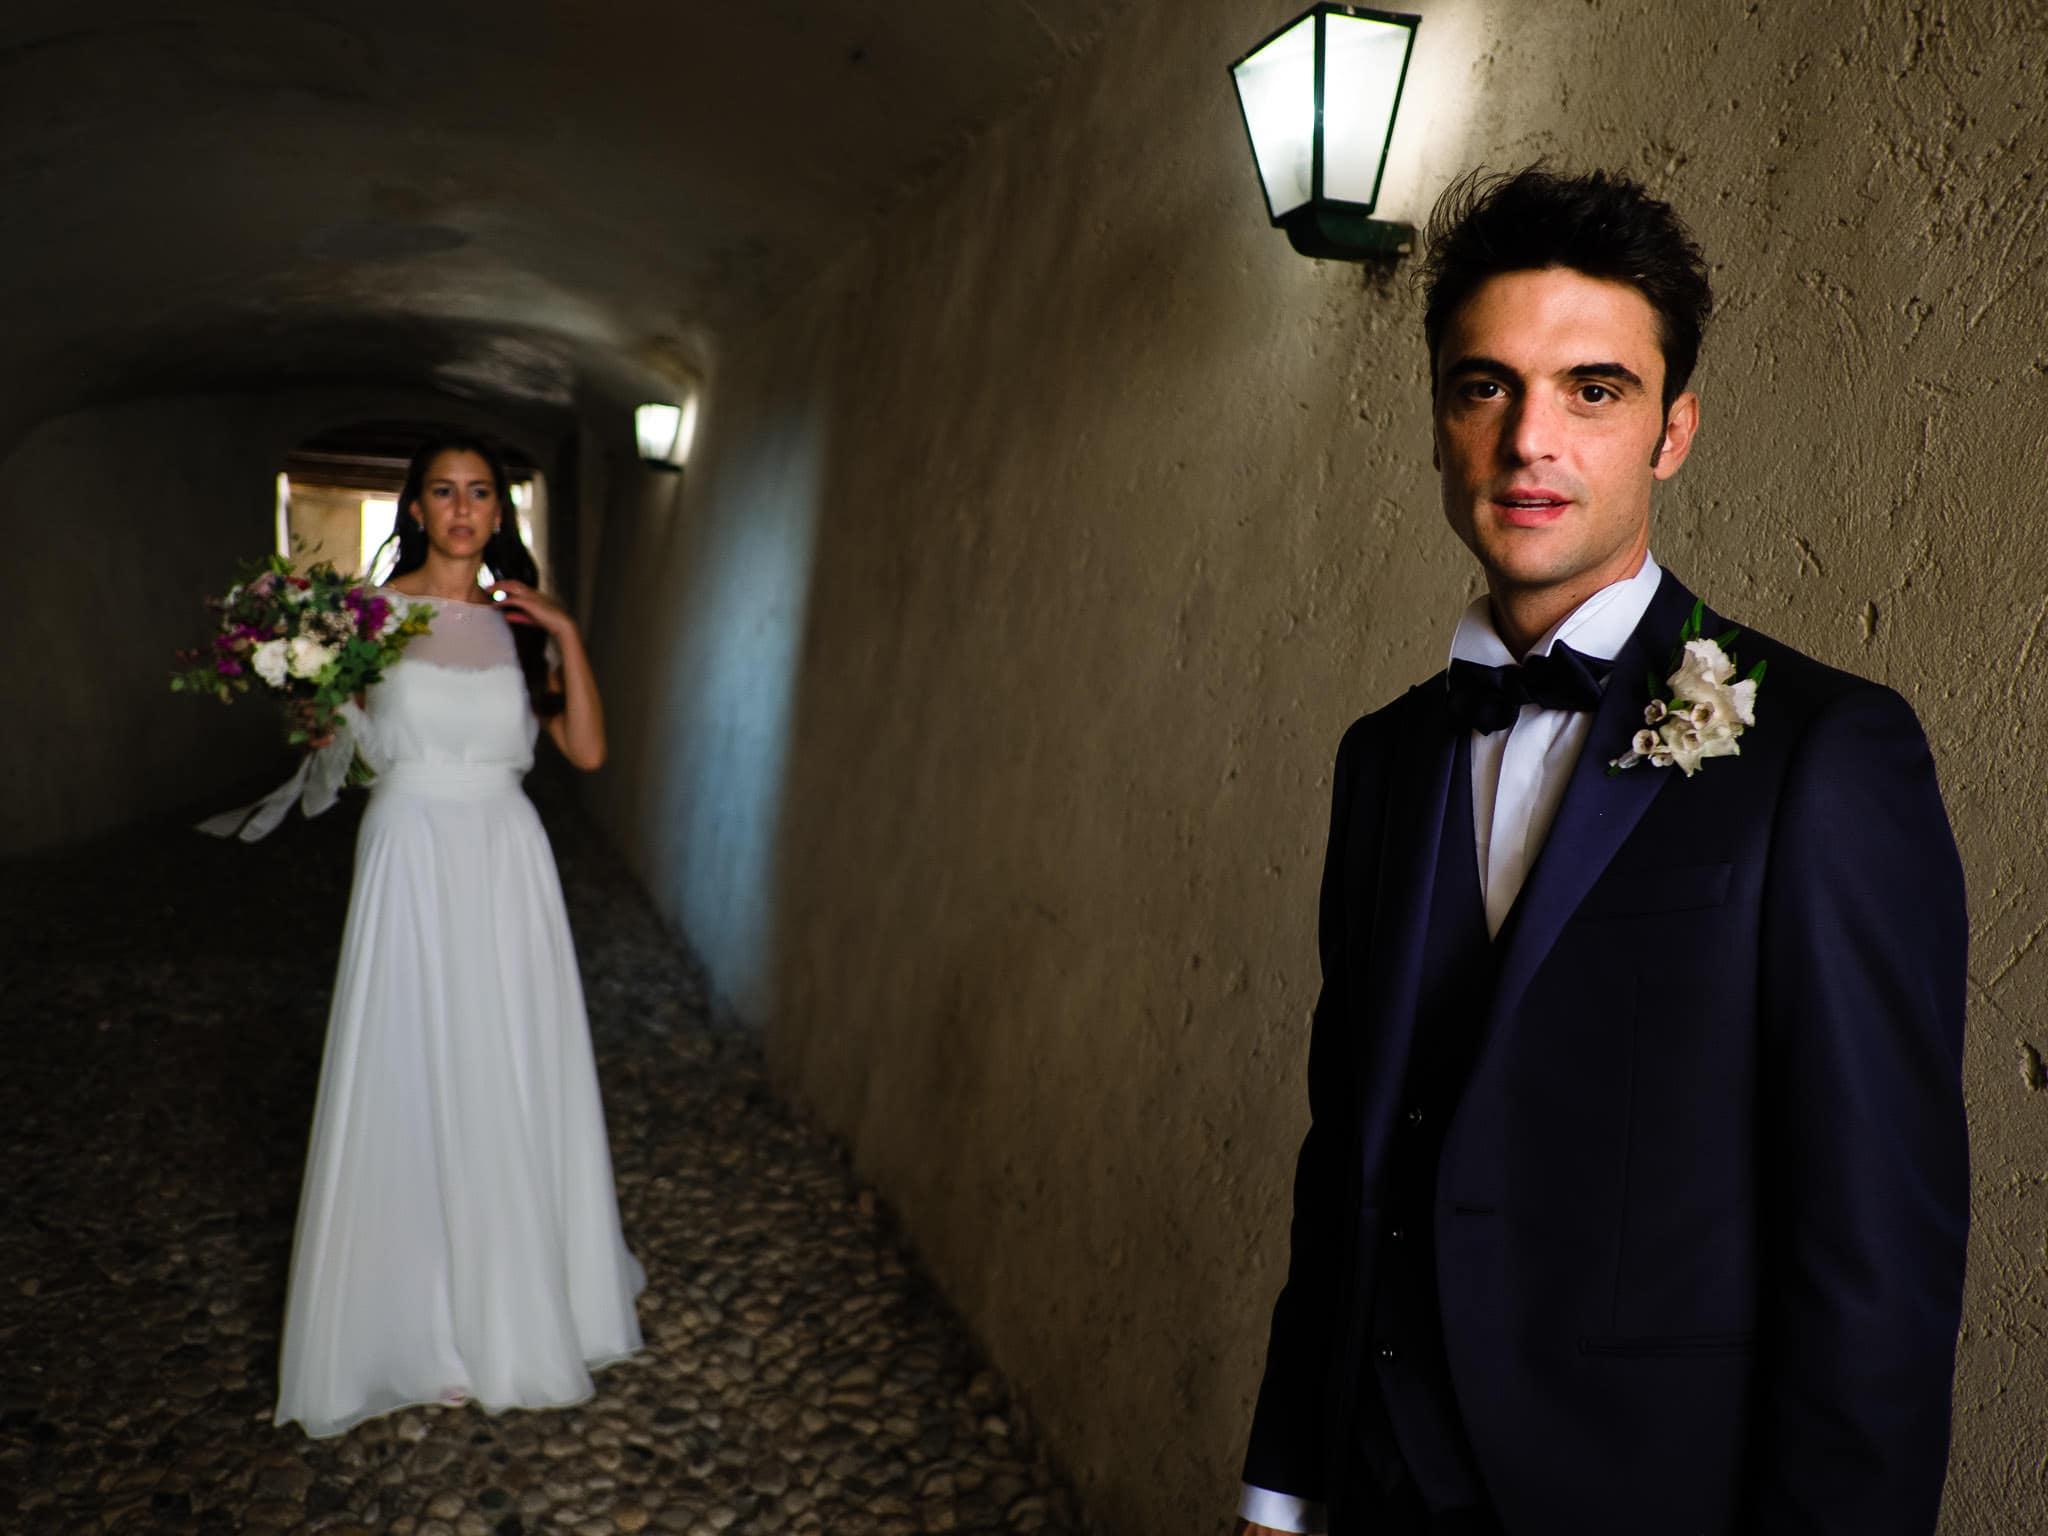 fotografo matrimonio lucarossifoto varese sacro monte Mulino dellOlio 40